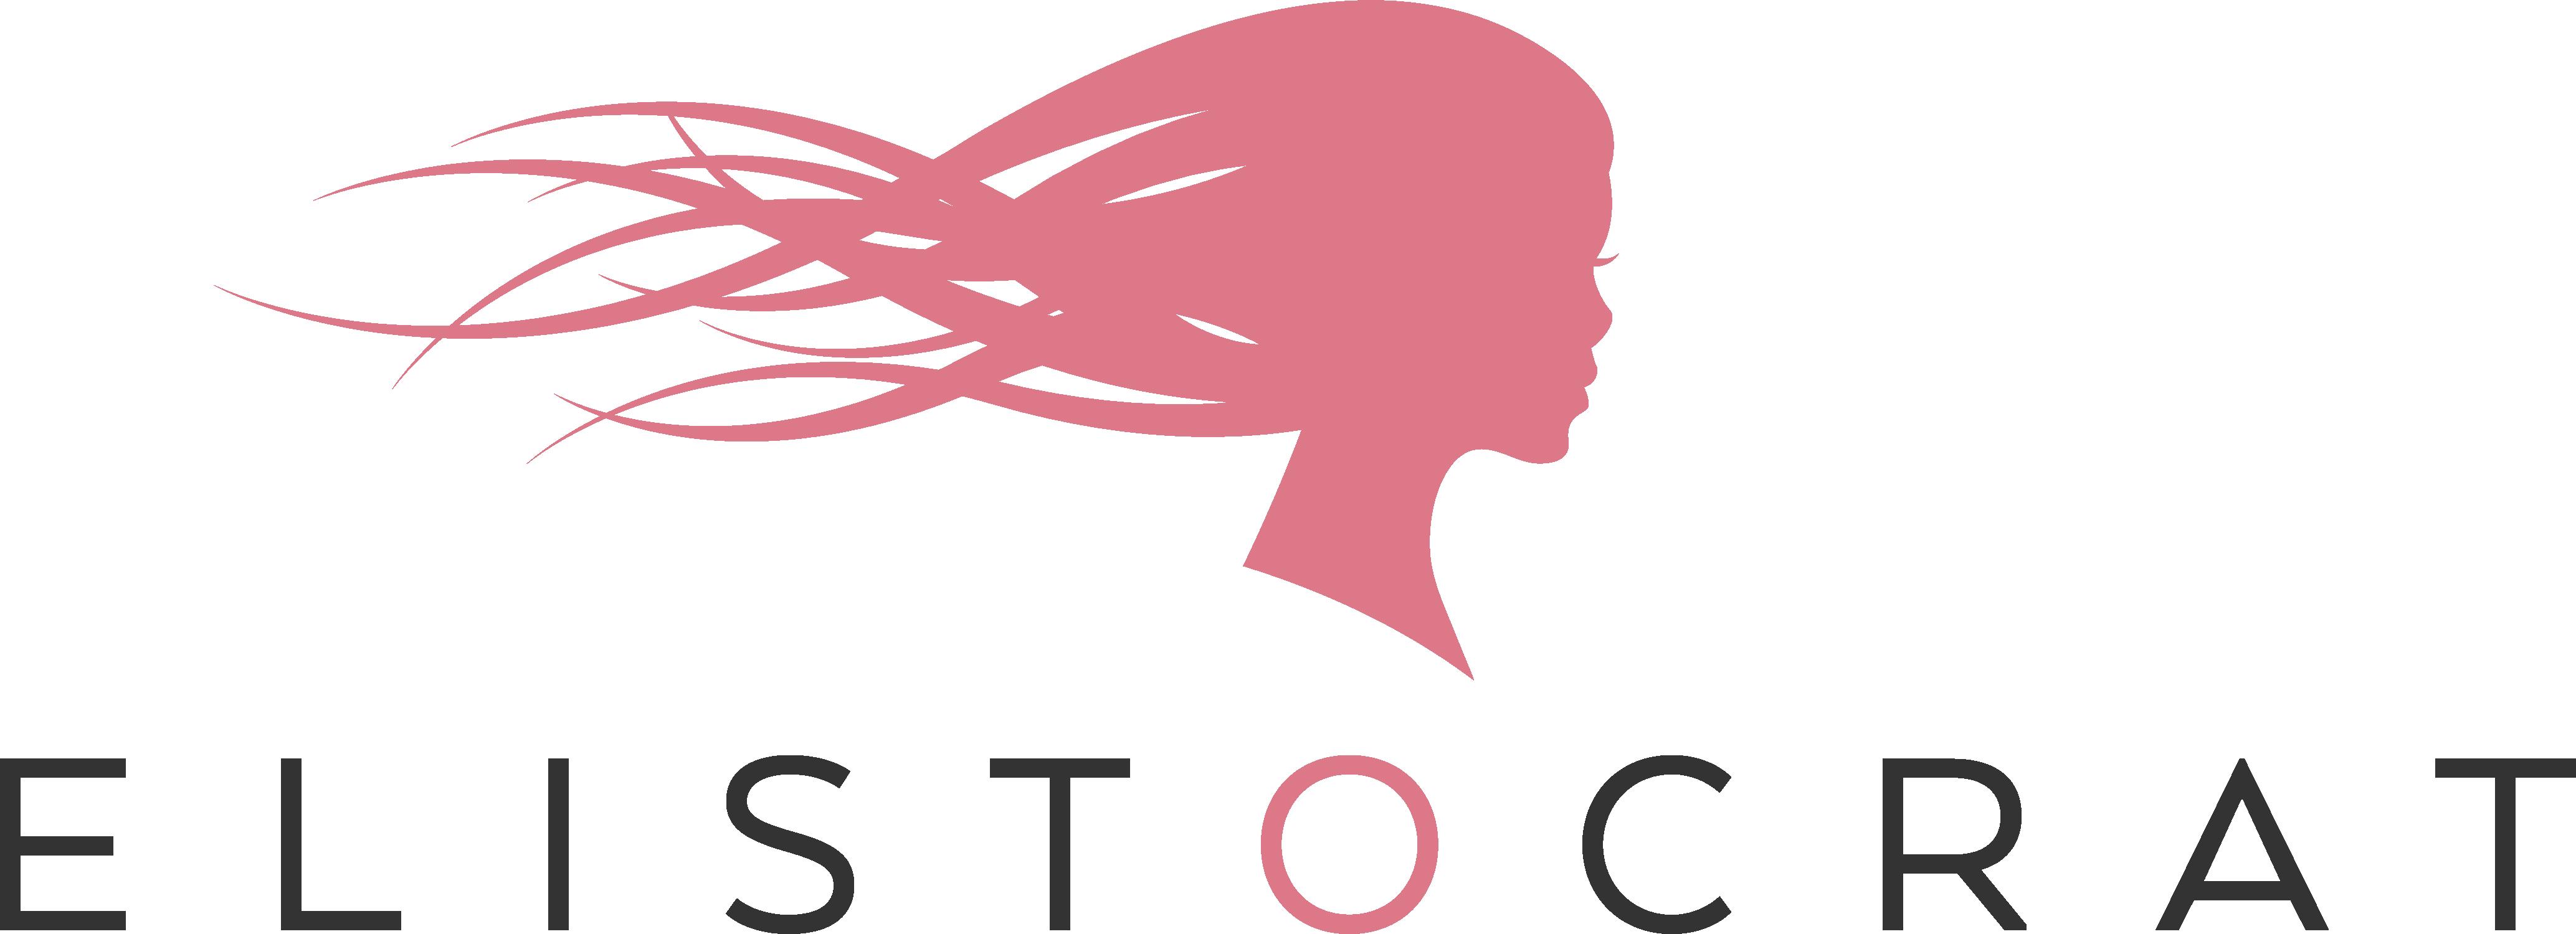 Hairdresser Directory | ELISTOCRAT